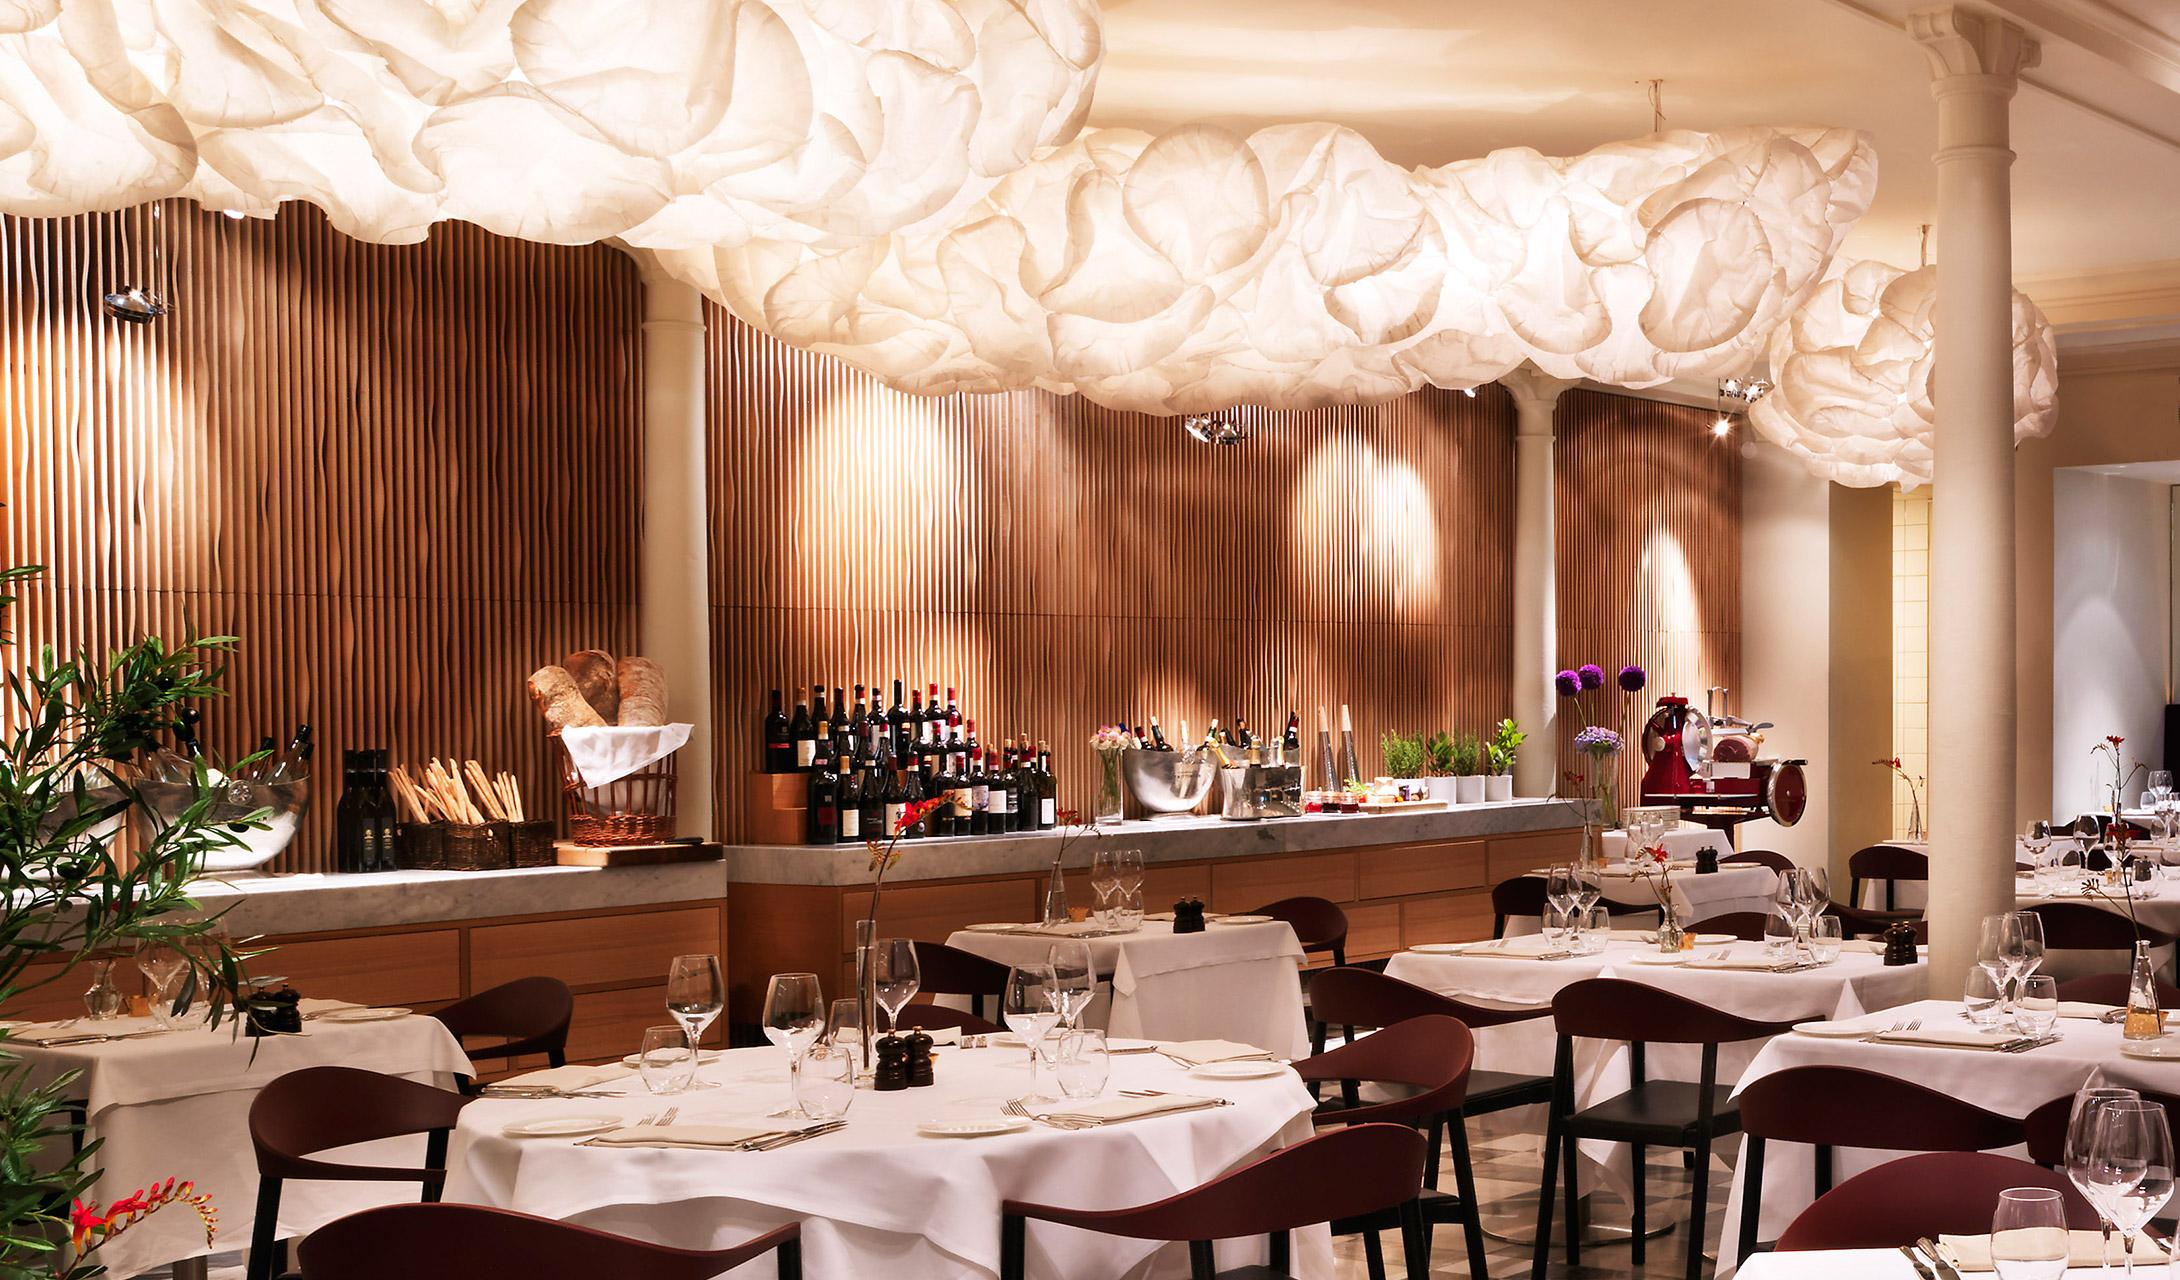 Nobis Hotel Caina restaurant. Fashionela